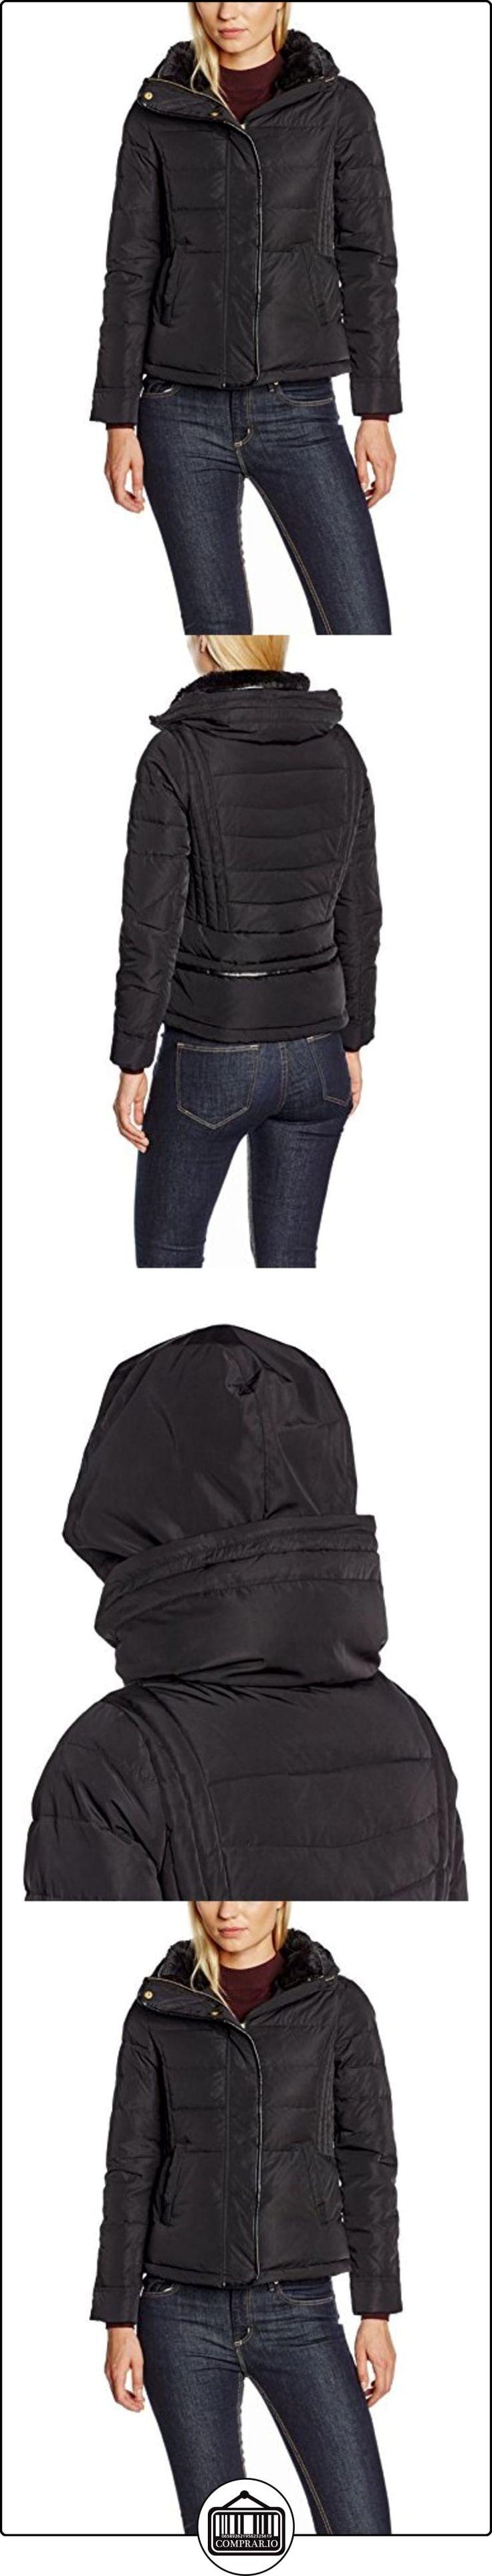 Naf Naf BU-Emma K1, Impermeable para Mujer, Negro, 40  ✿ Abrigos y chaquetas ✿